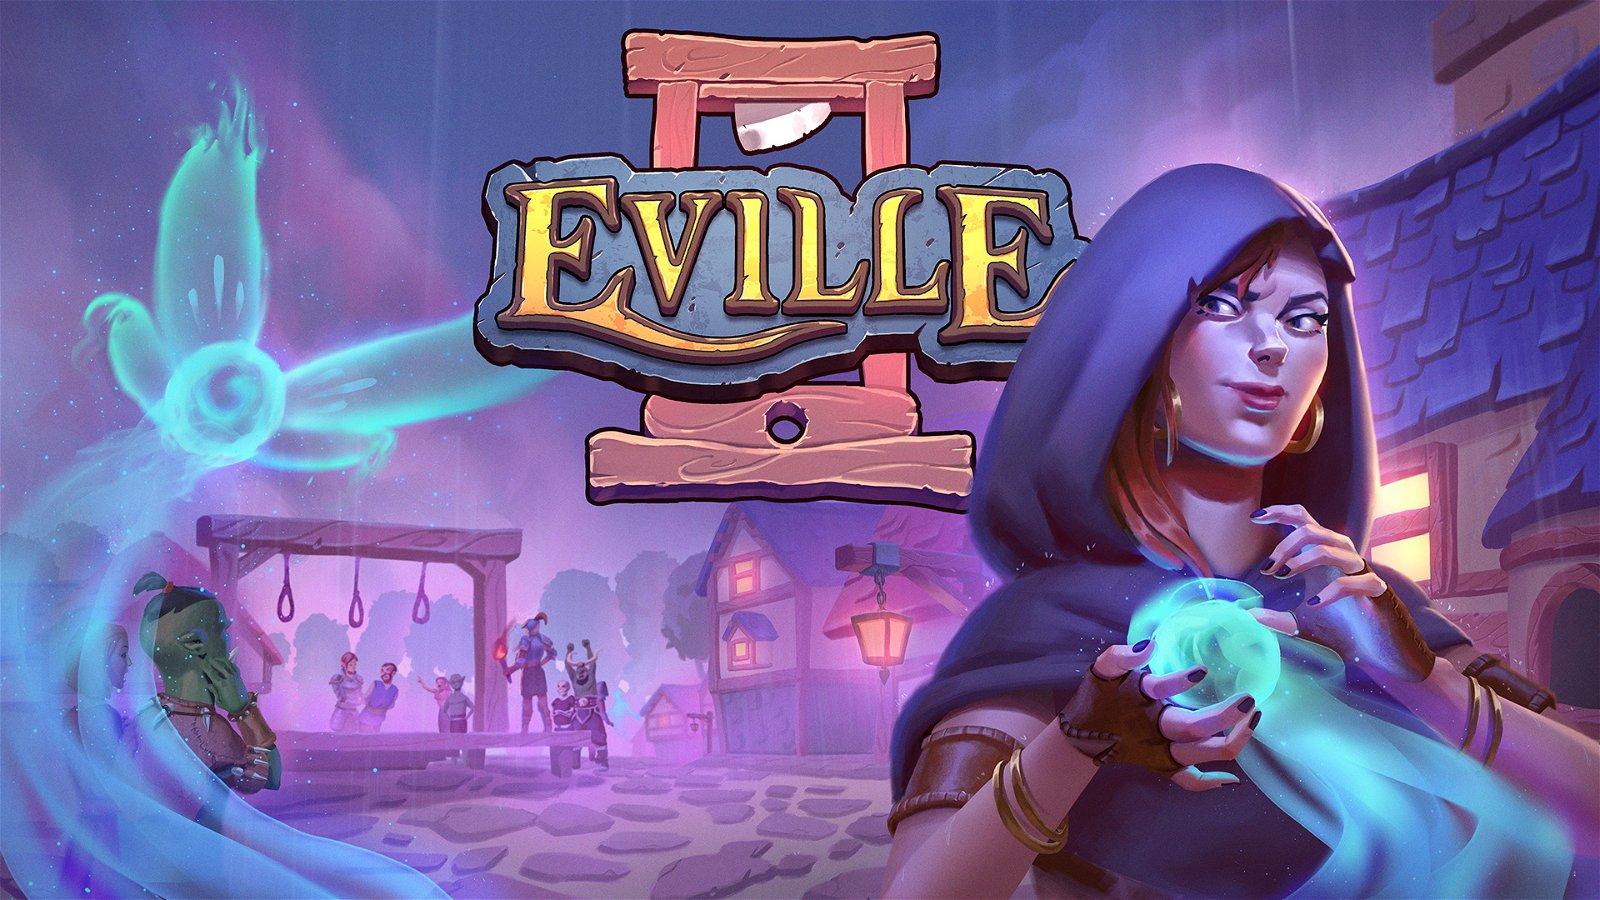 Eville Puts A New Villainous Spin on Social Deduction Games 2